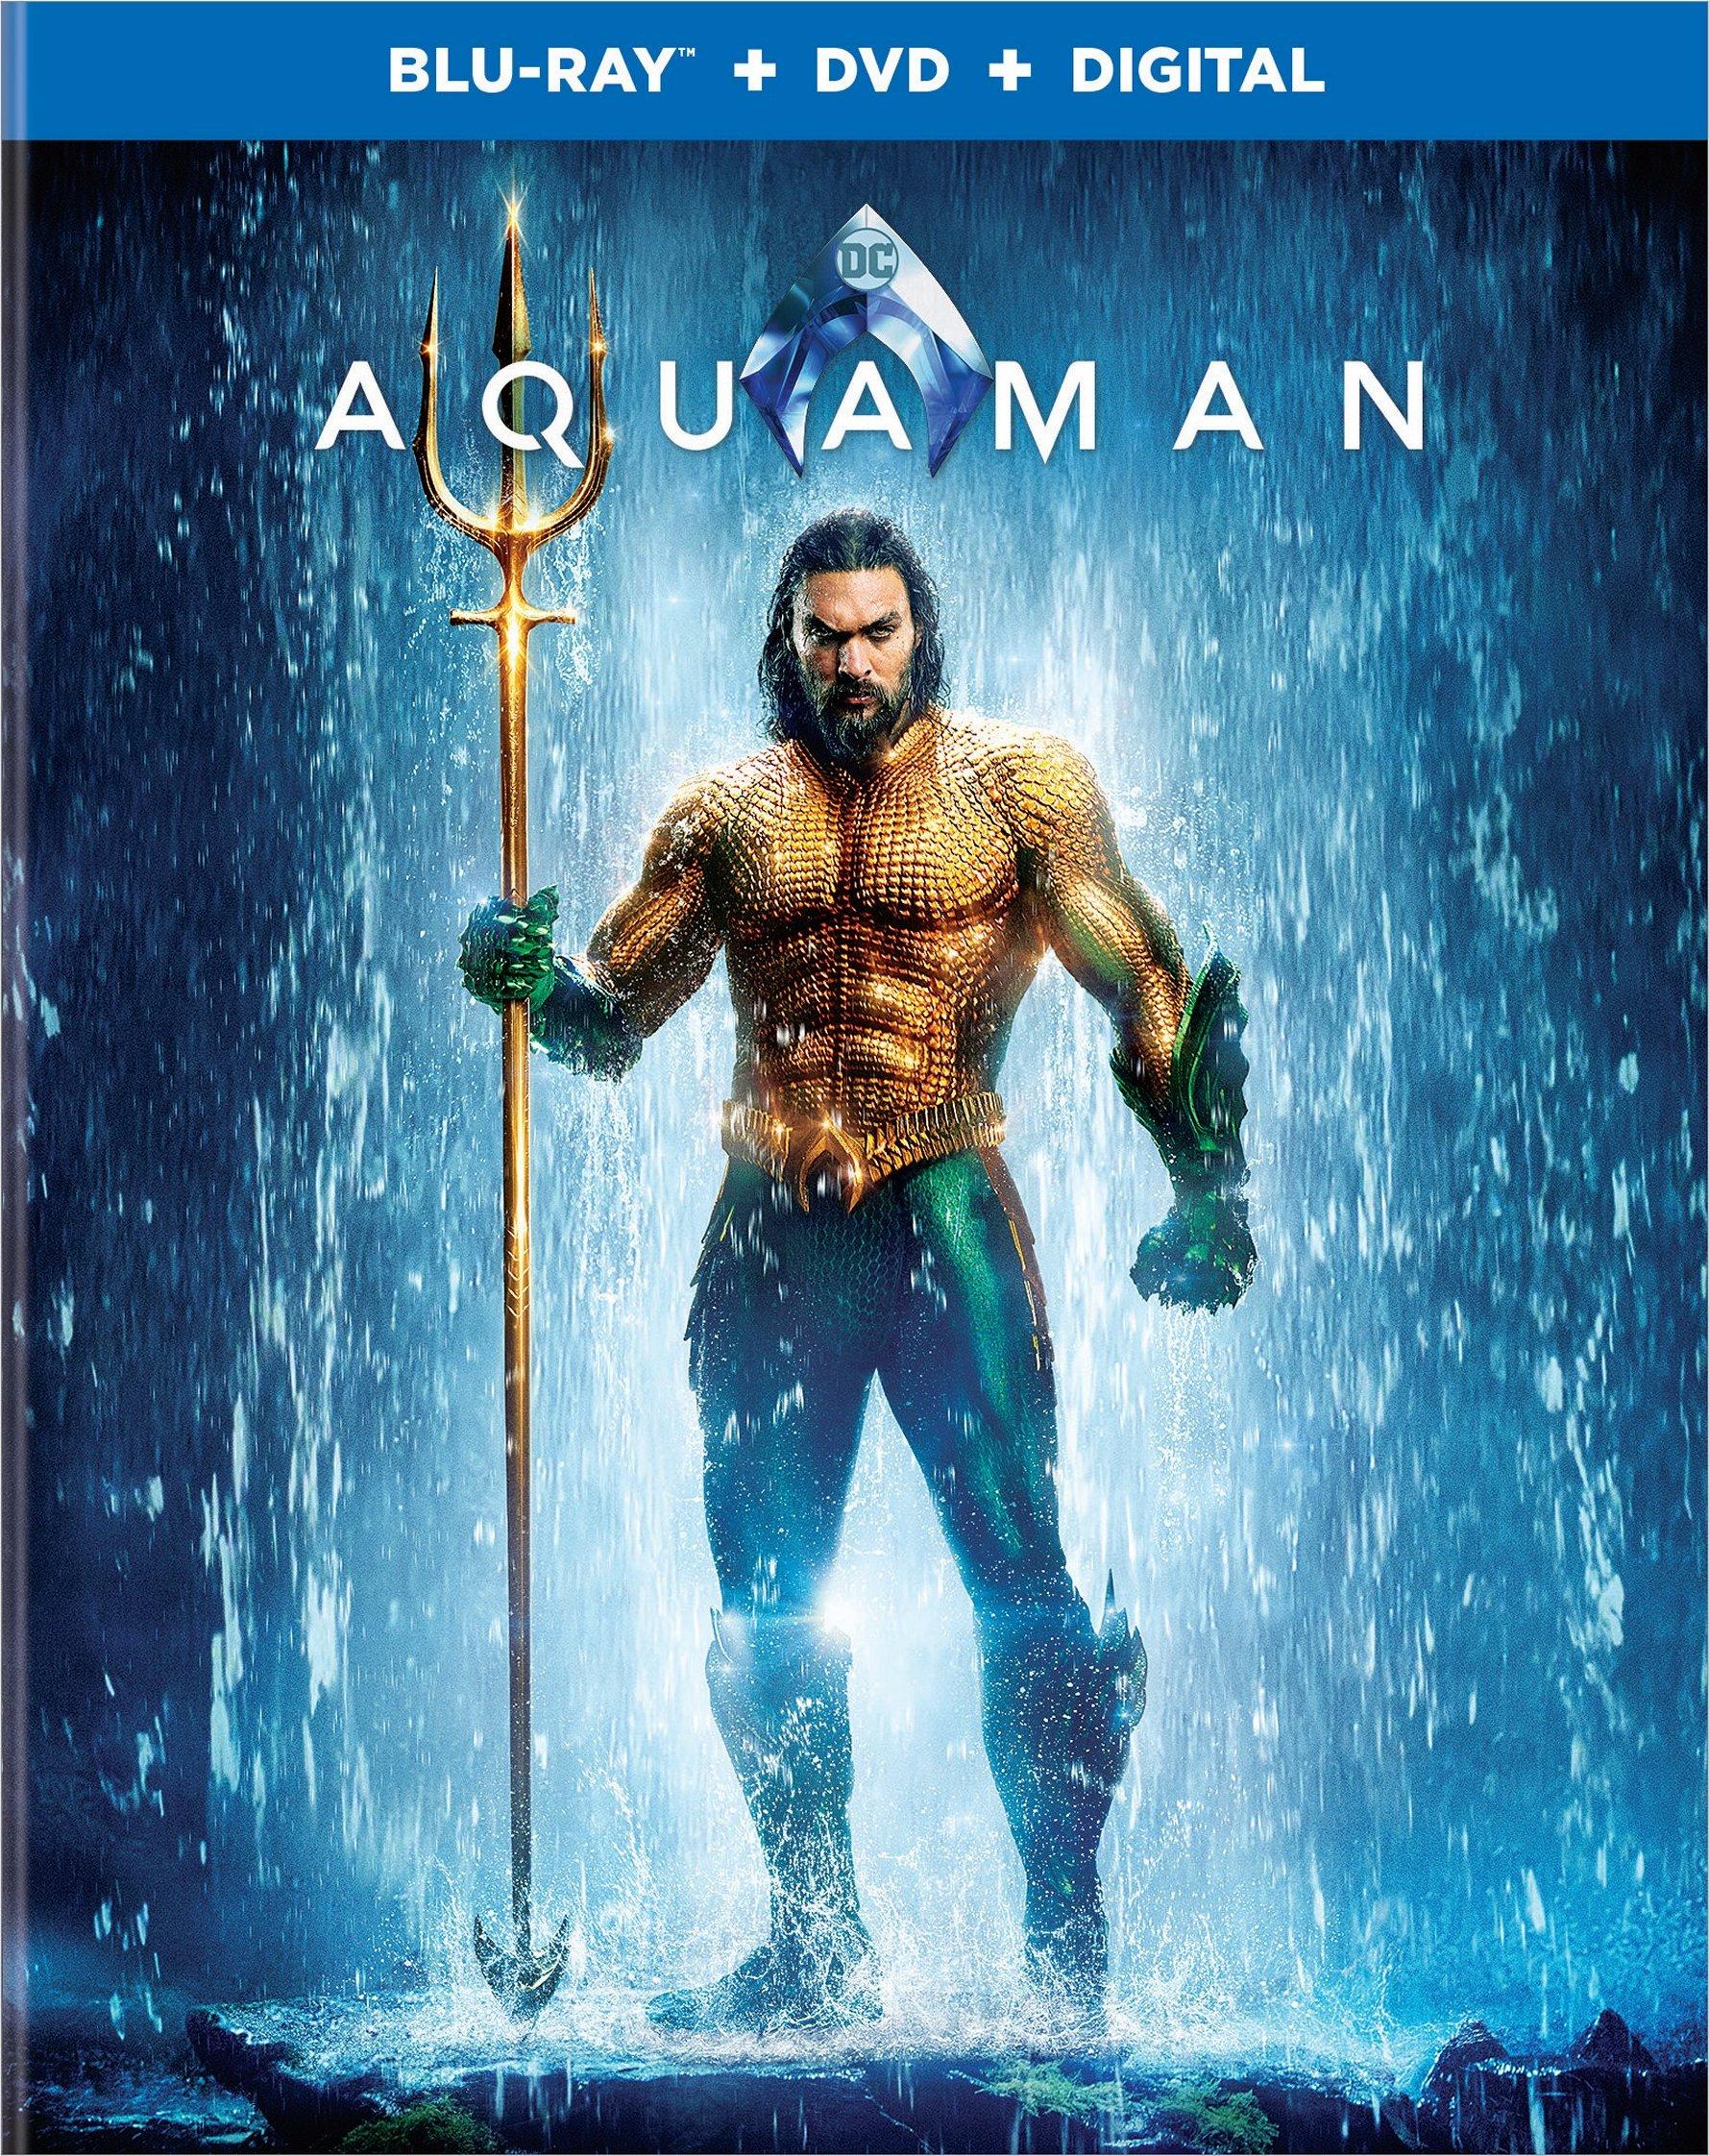 Aquaman (2018) poster image